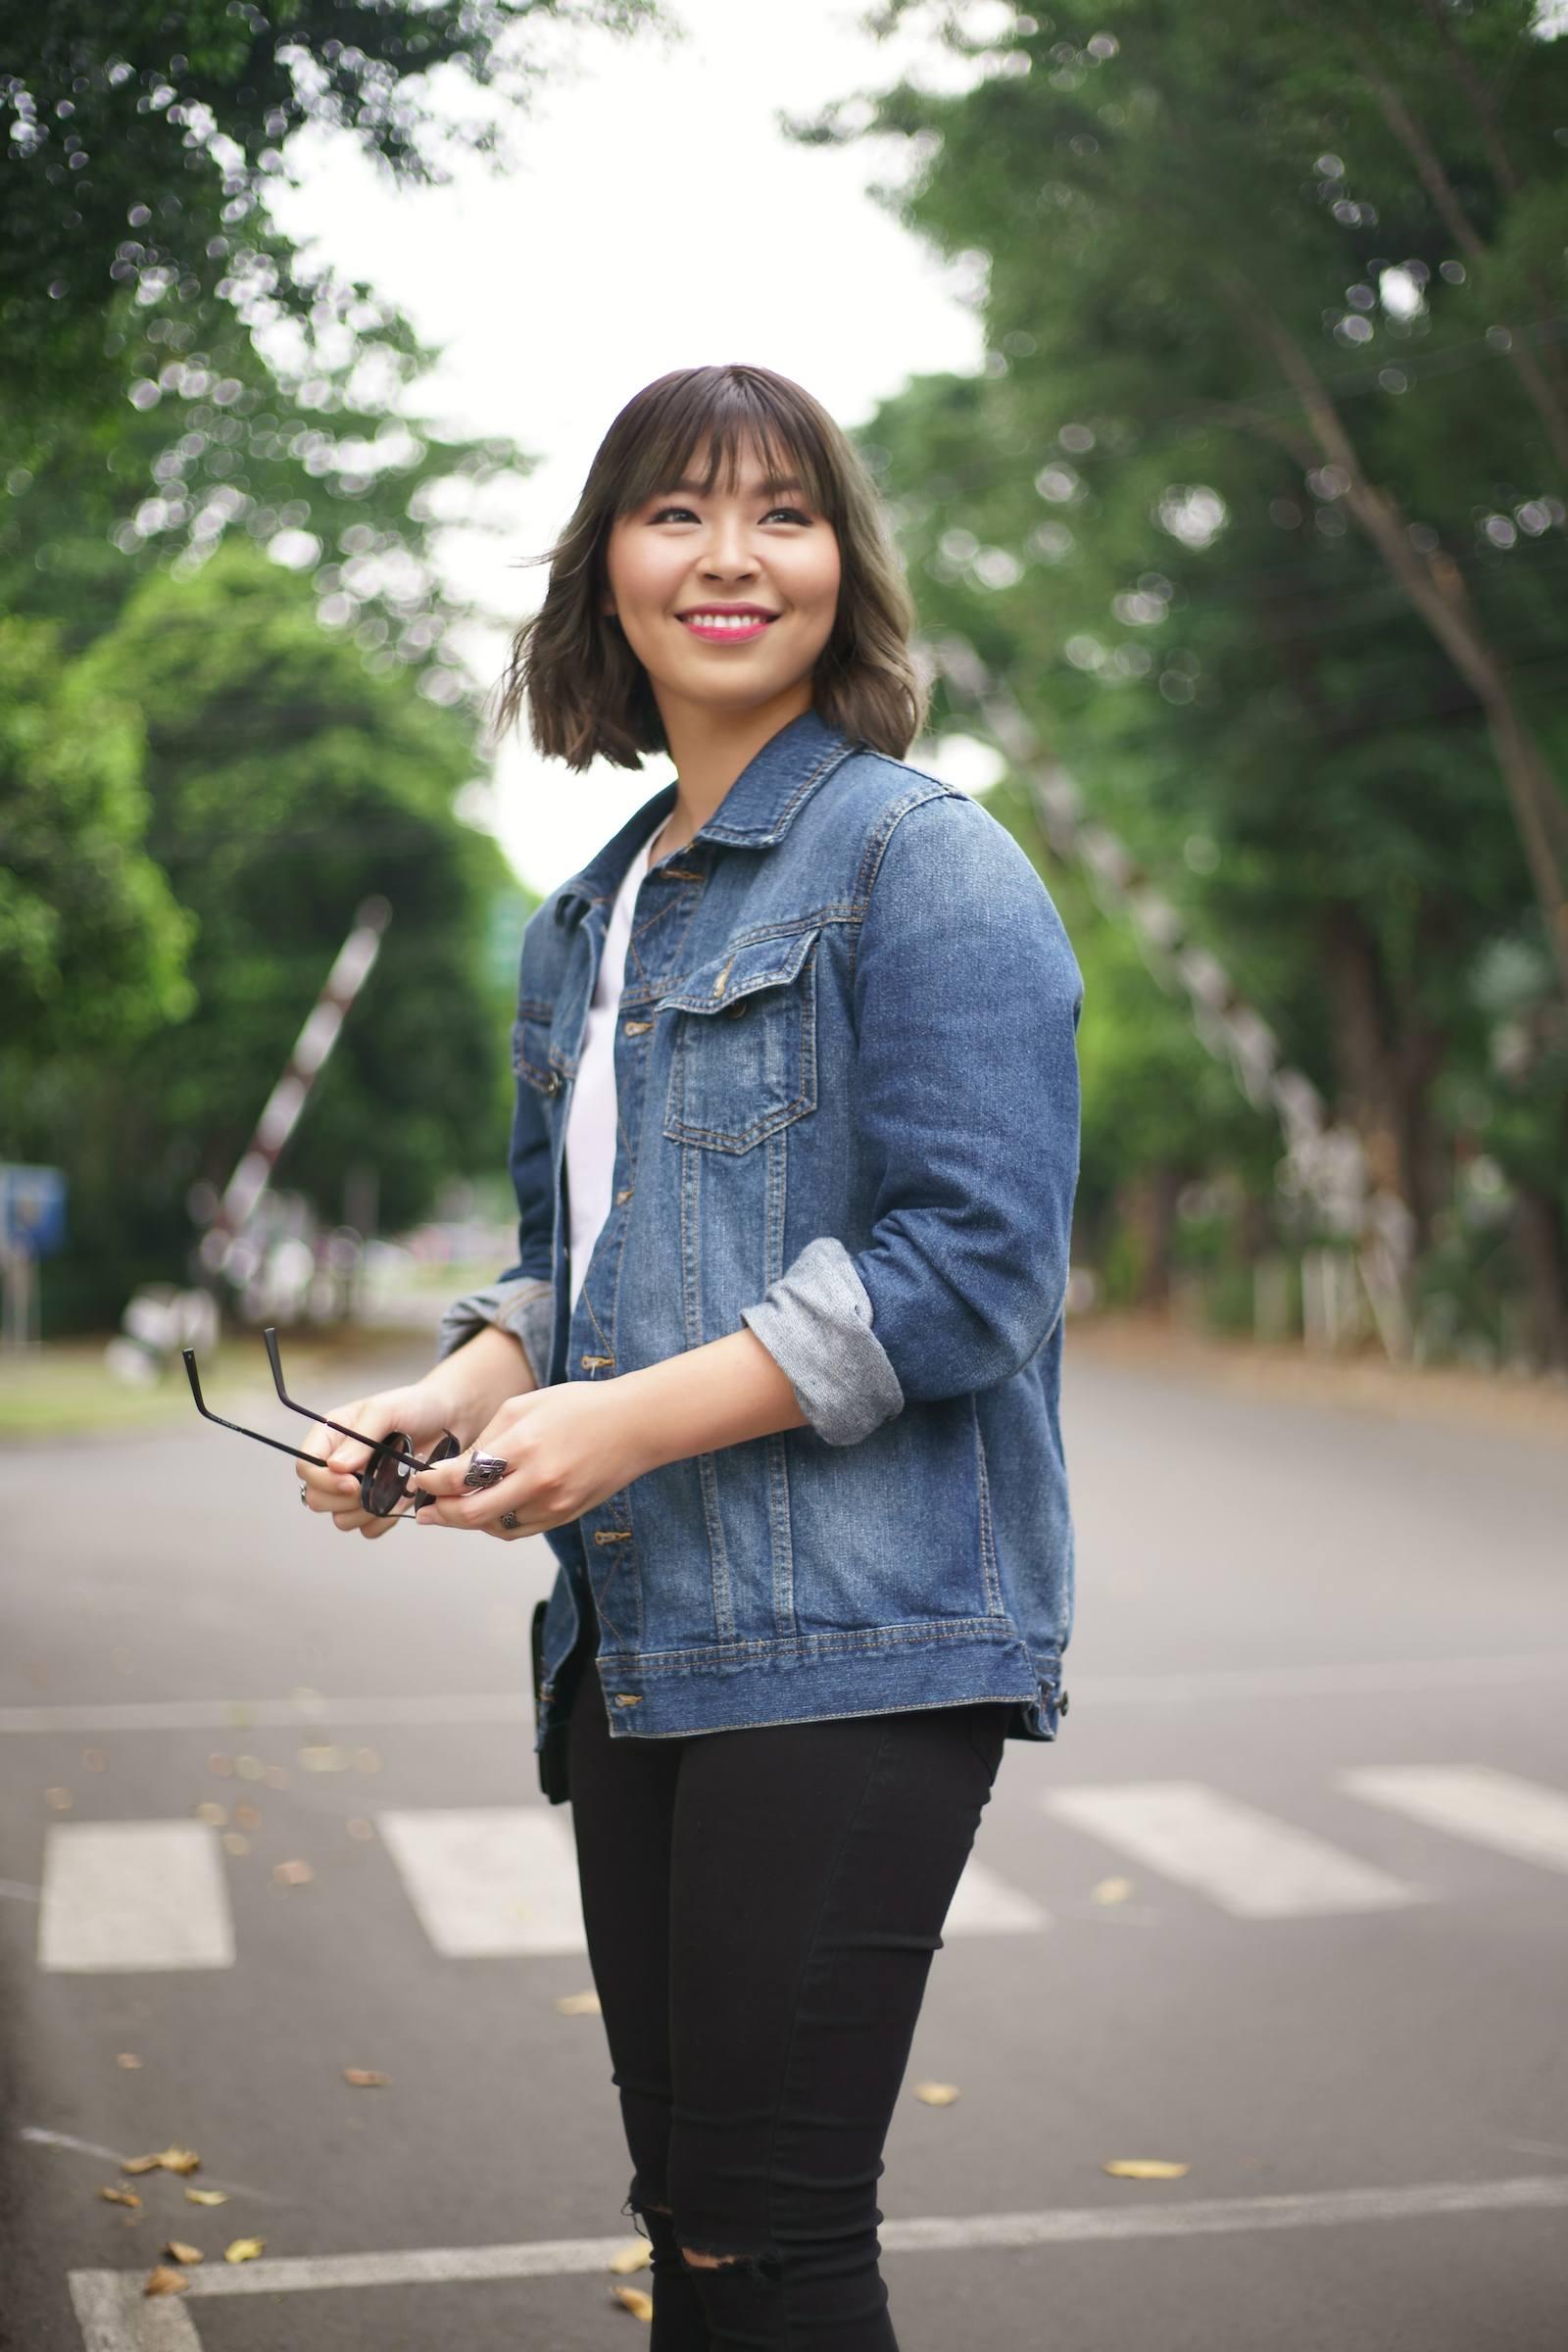 Wanita Asia dengan rambut beach waves pendek sedang menyeberang jalan